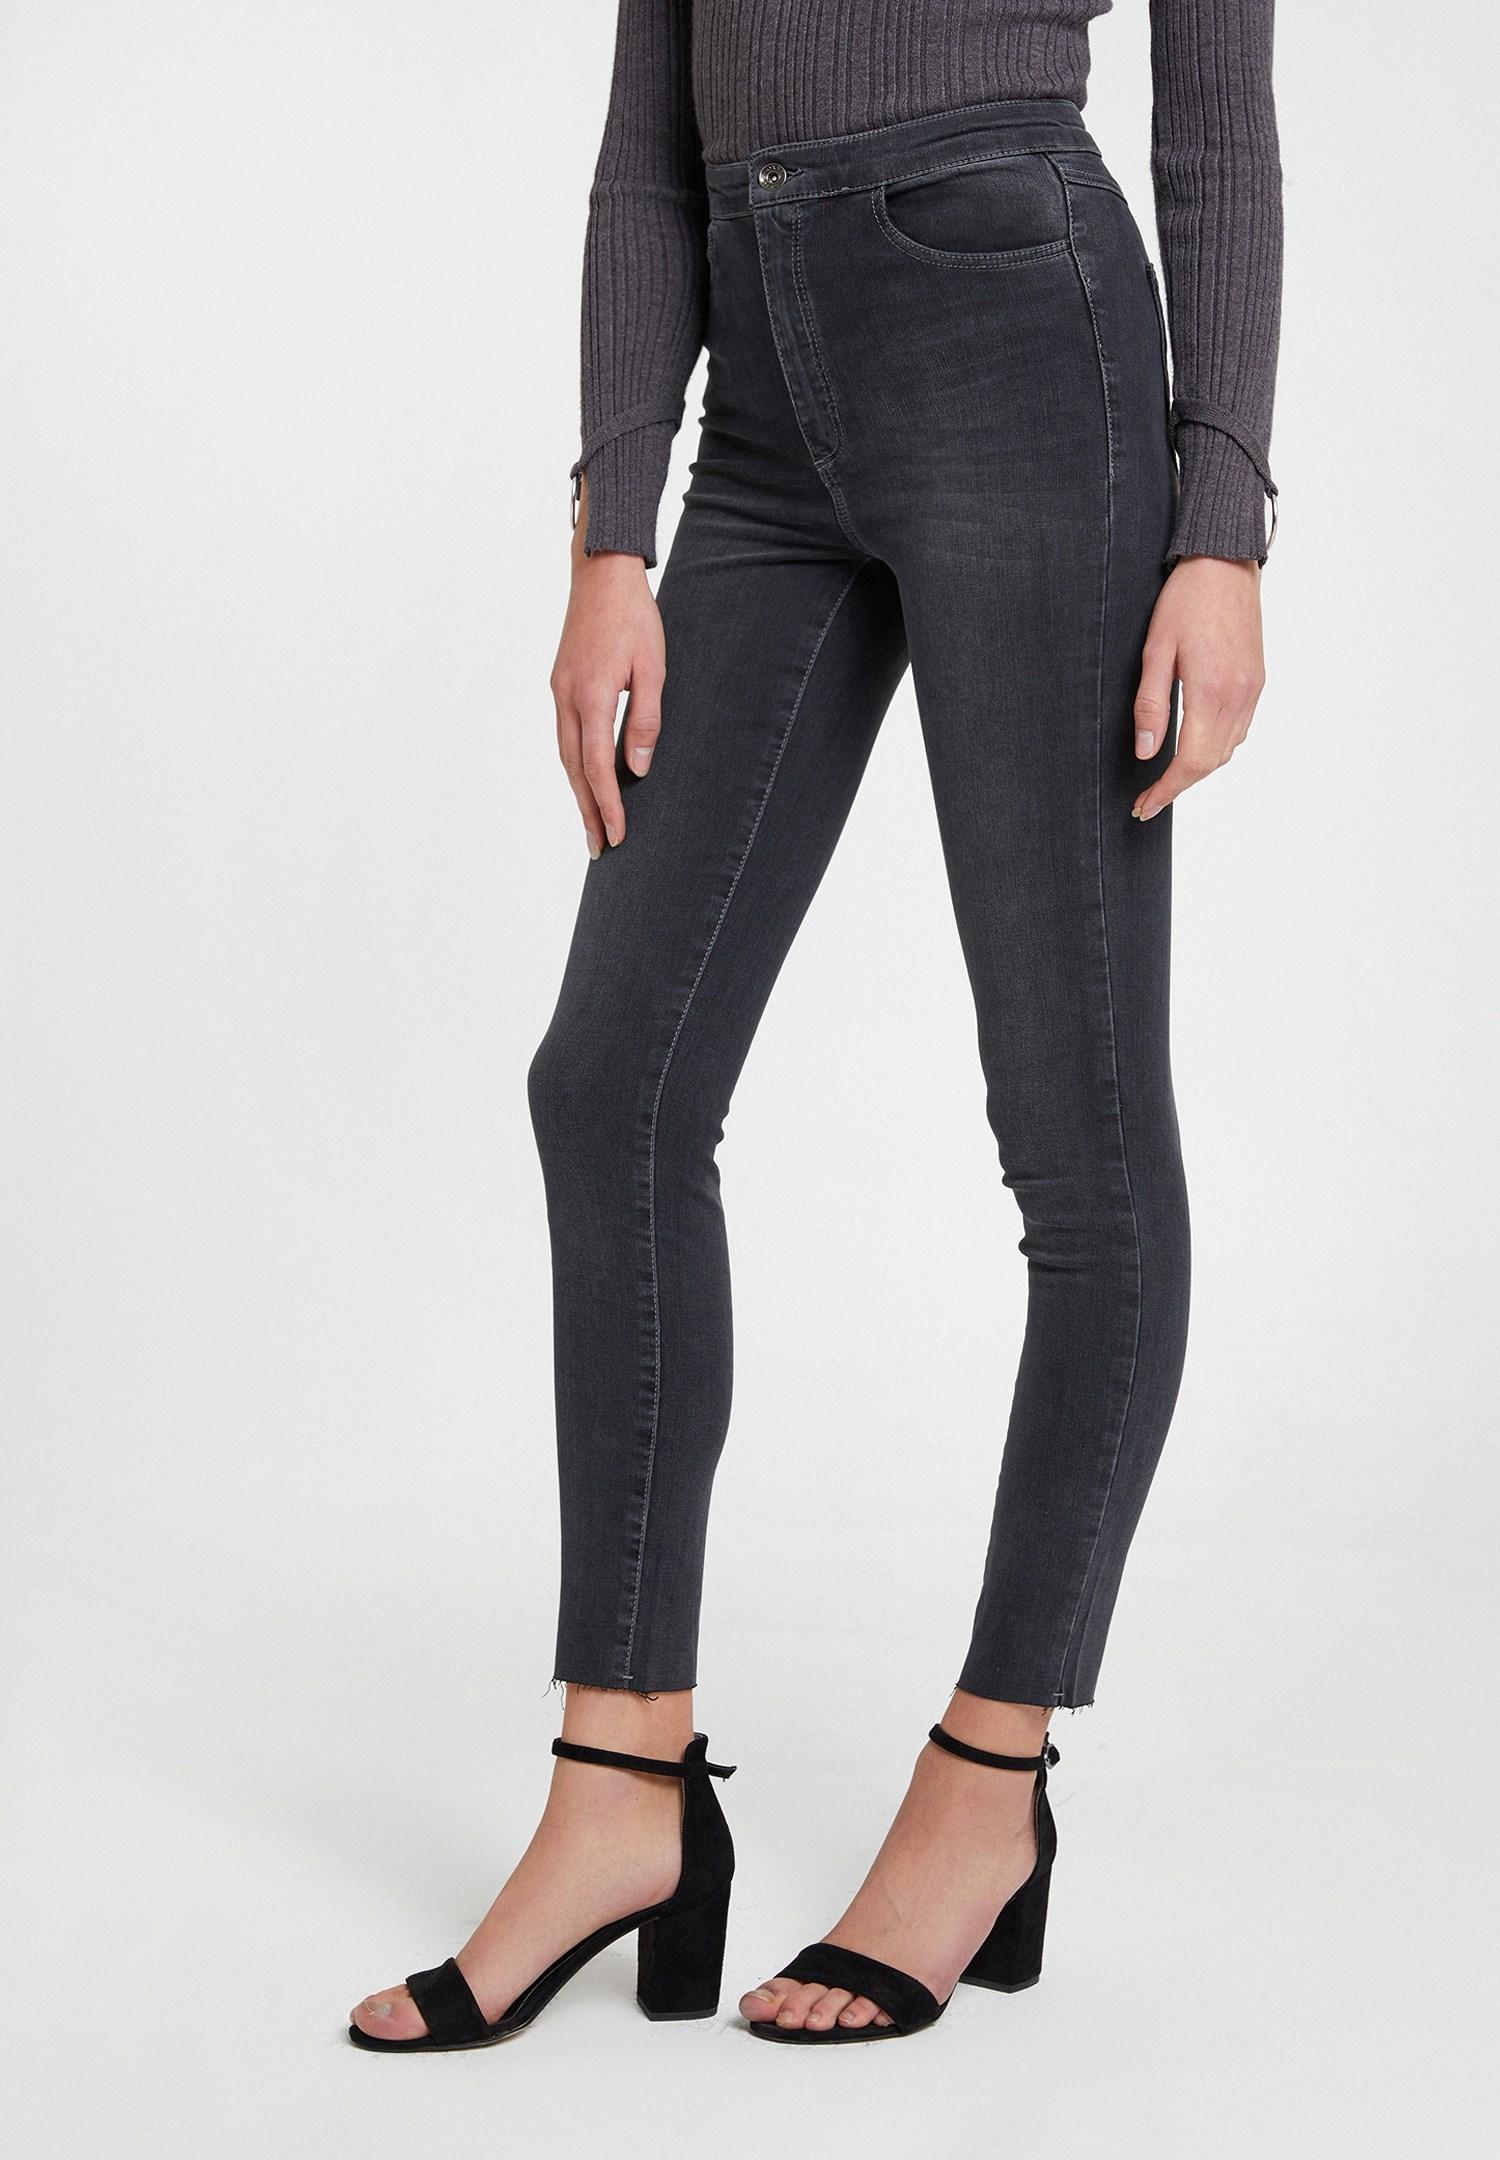 Women Grey High Waist Denim Pants with Cuff Details